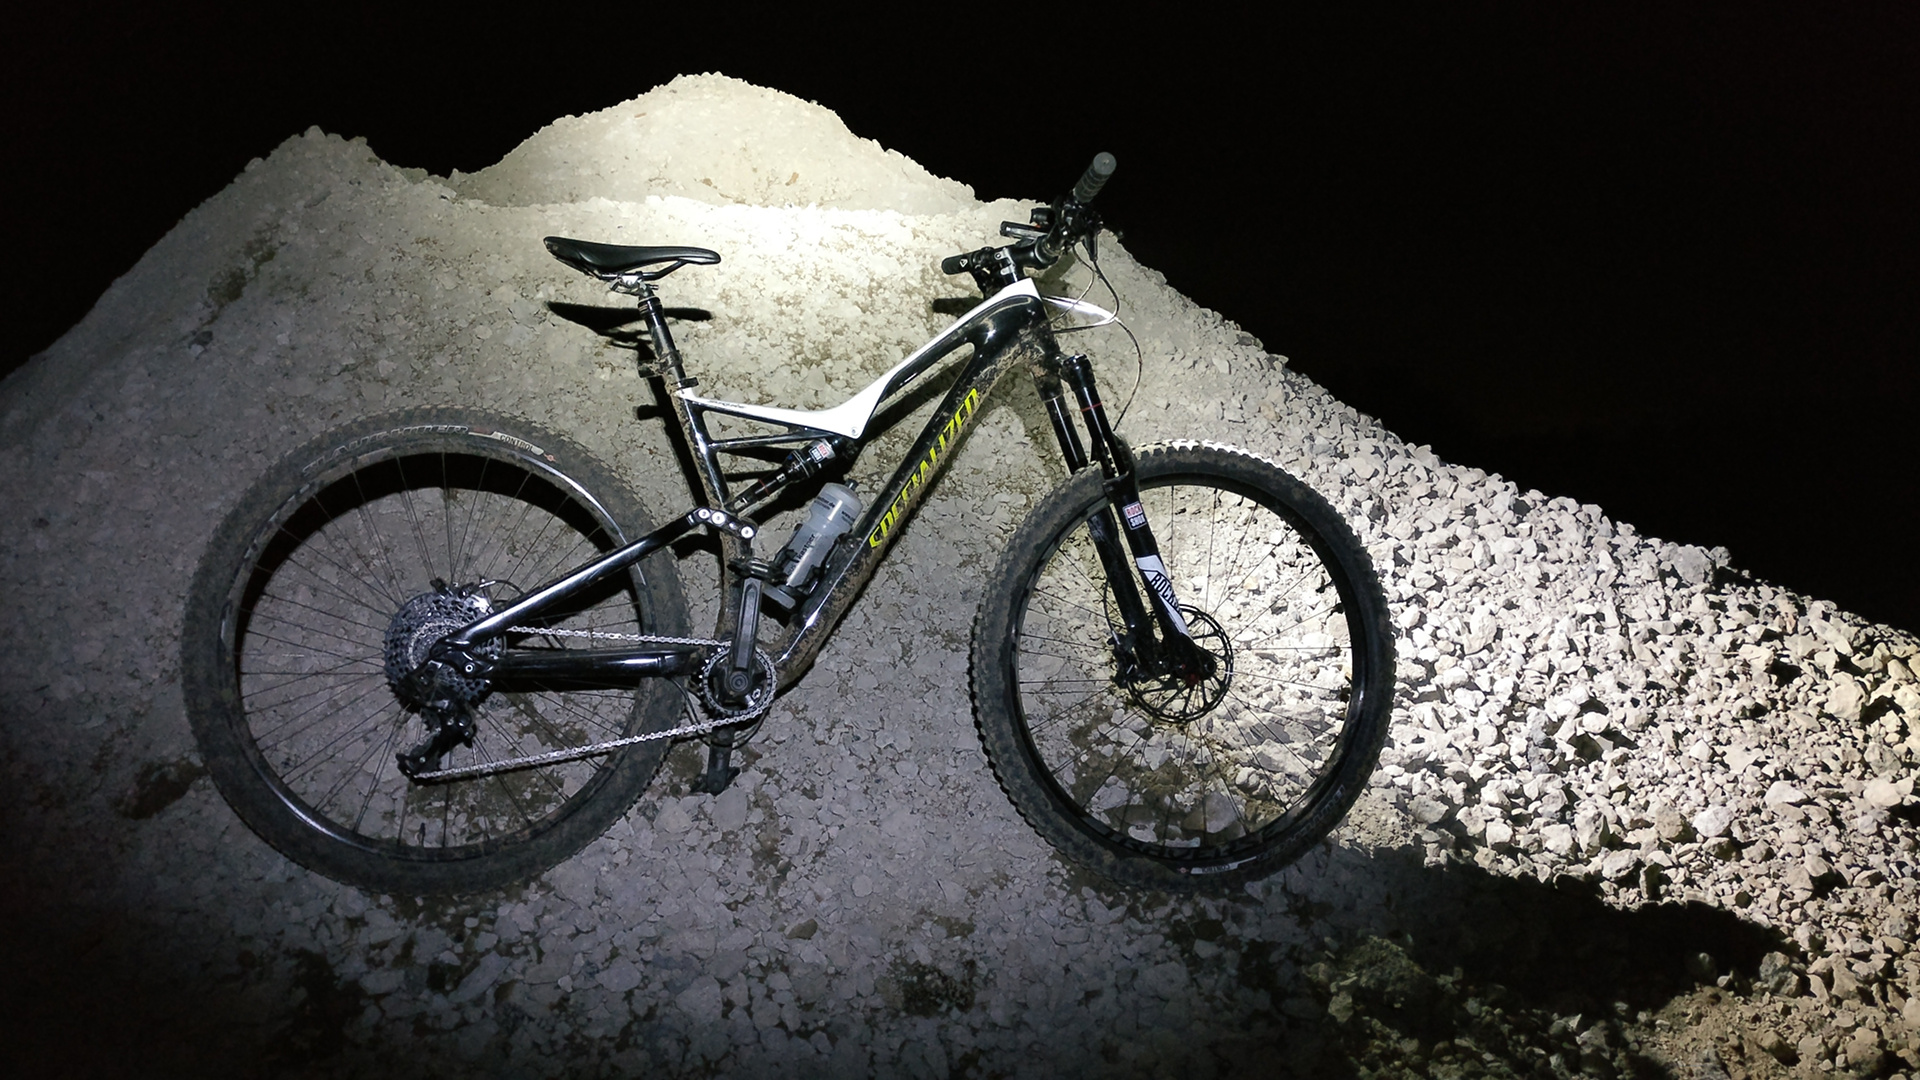 Konafahrers neues Lieblingsbike bei Nacht